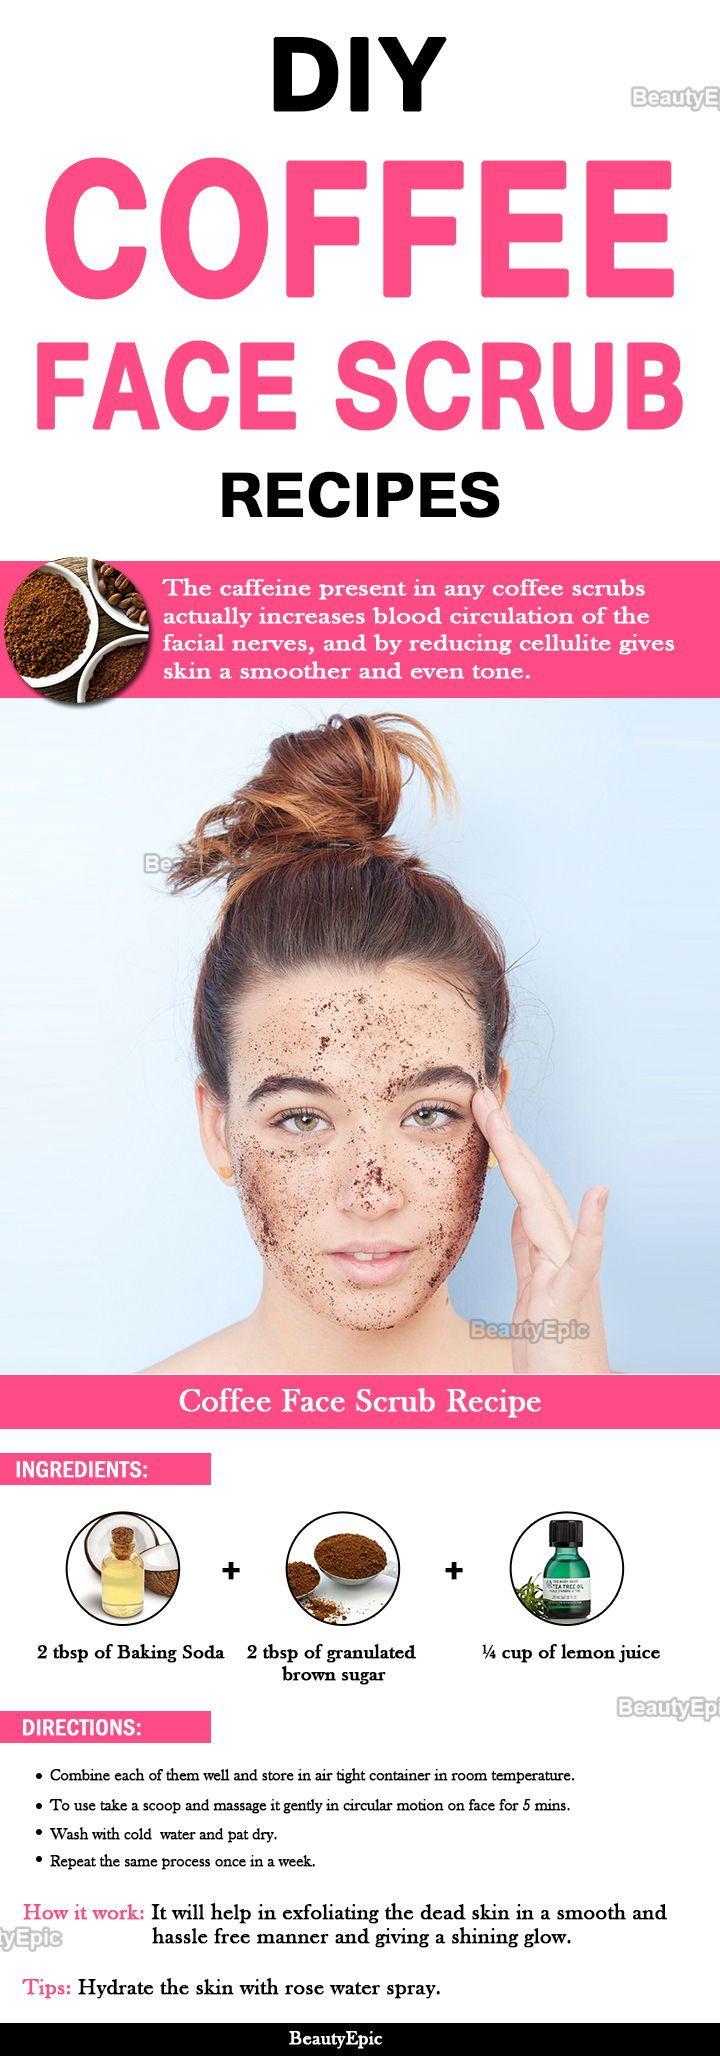 12 diy coffee face scrub recipes to get beautiful skin